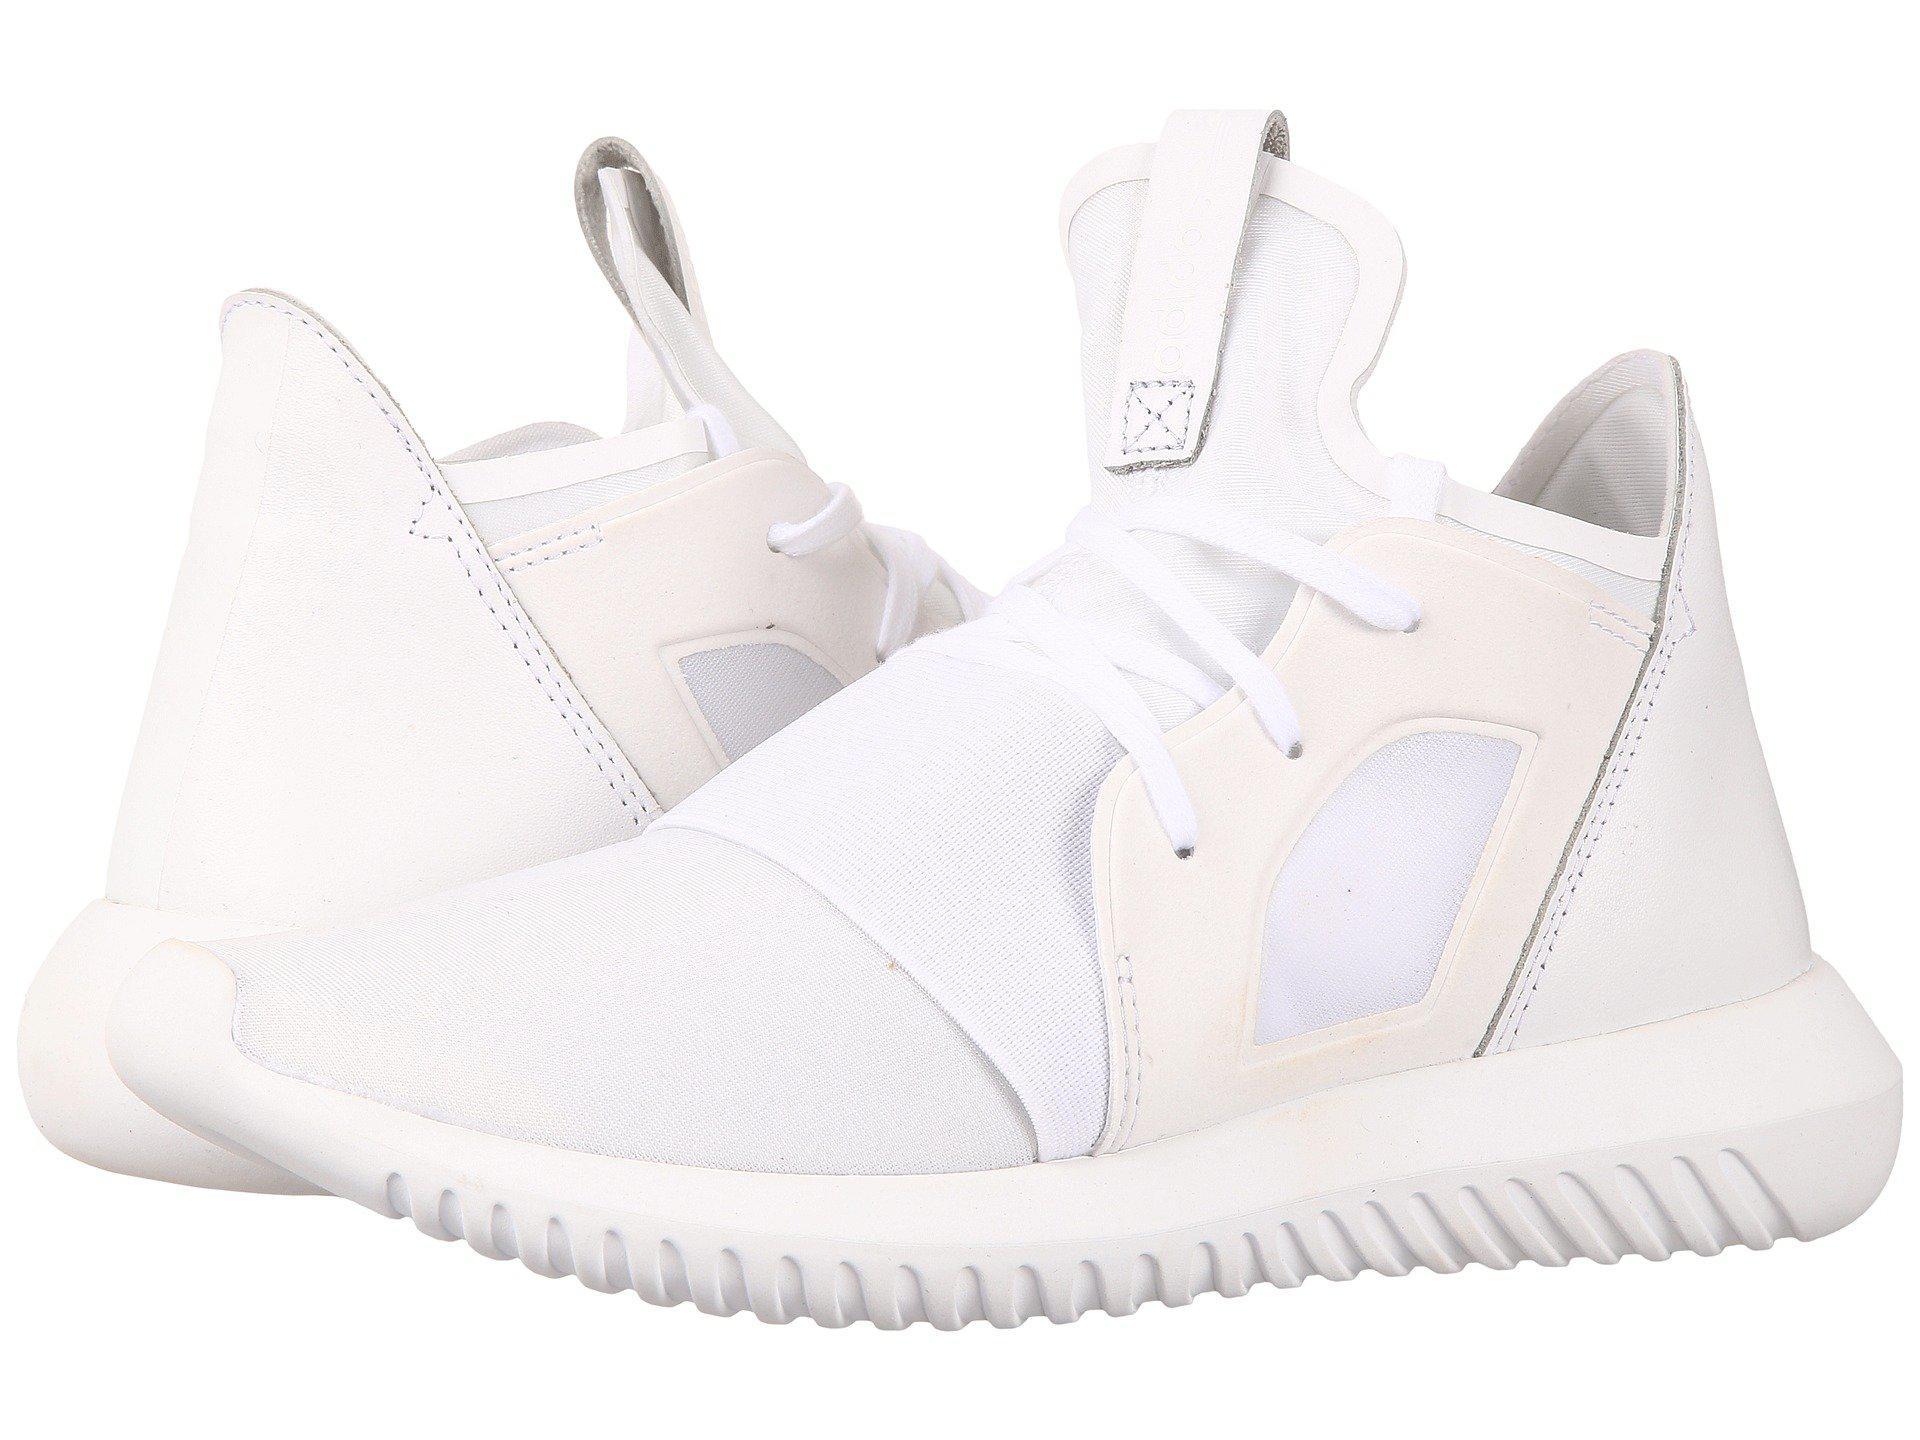 lyst adidas originali tubulare ribelle in bianco